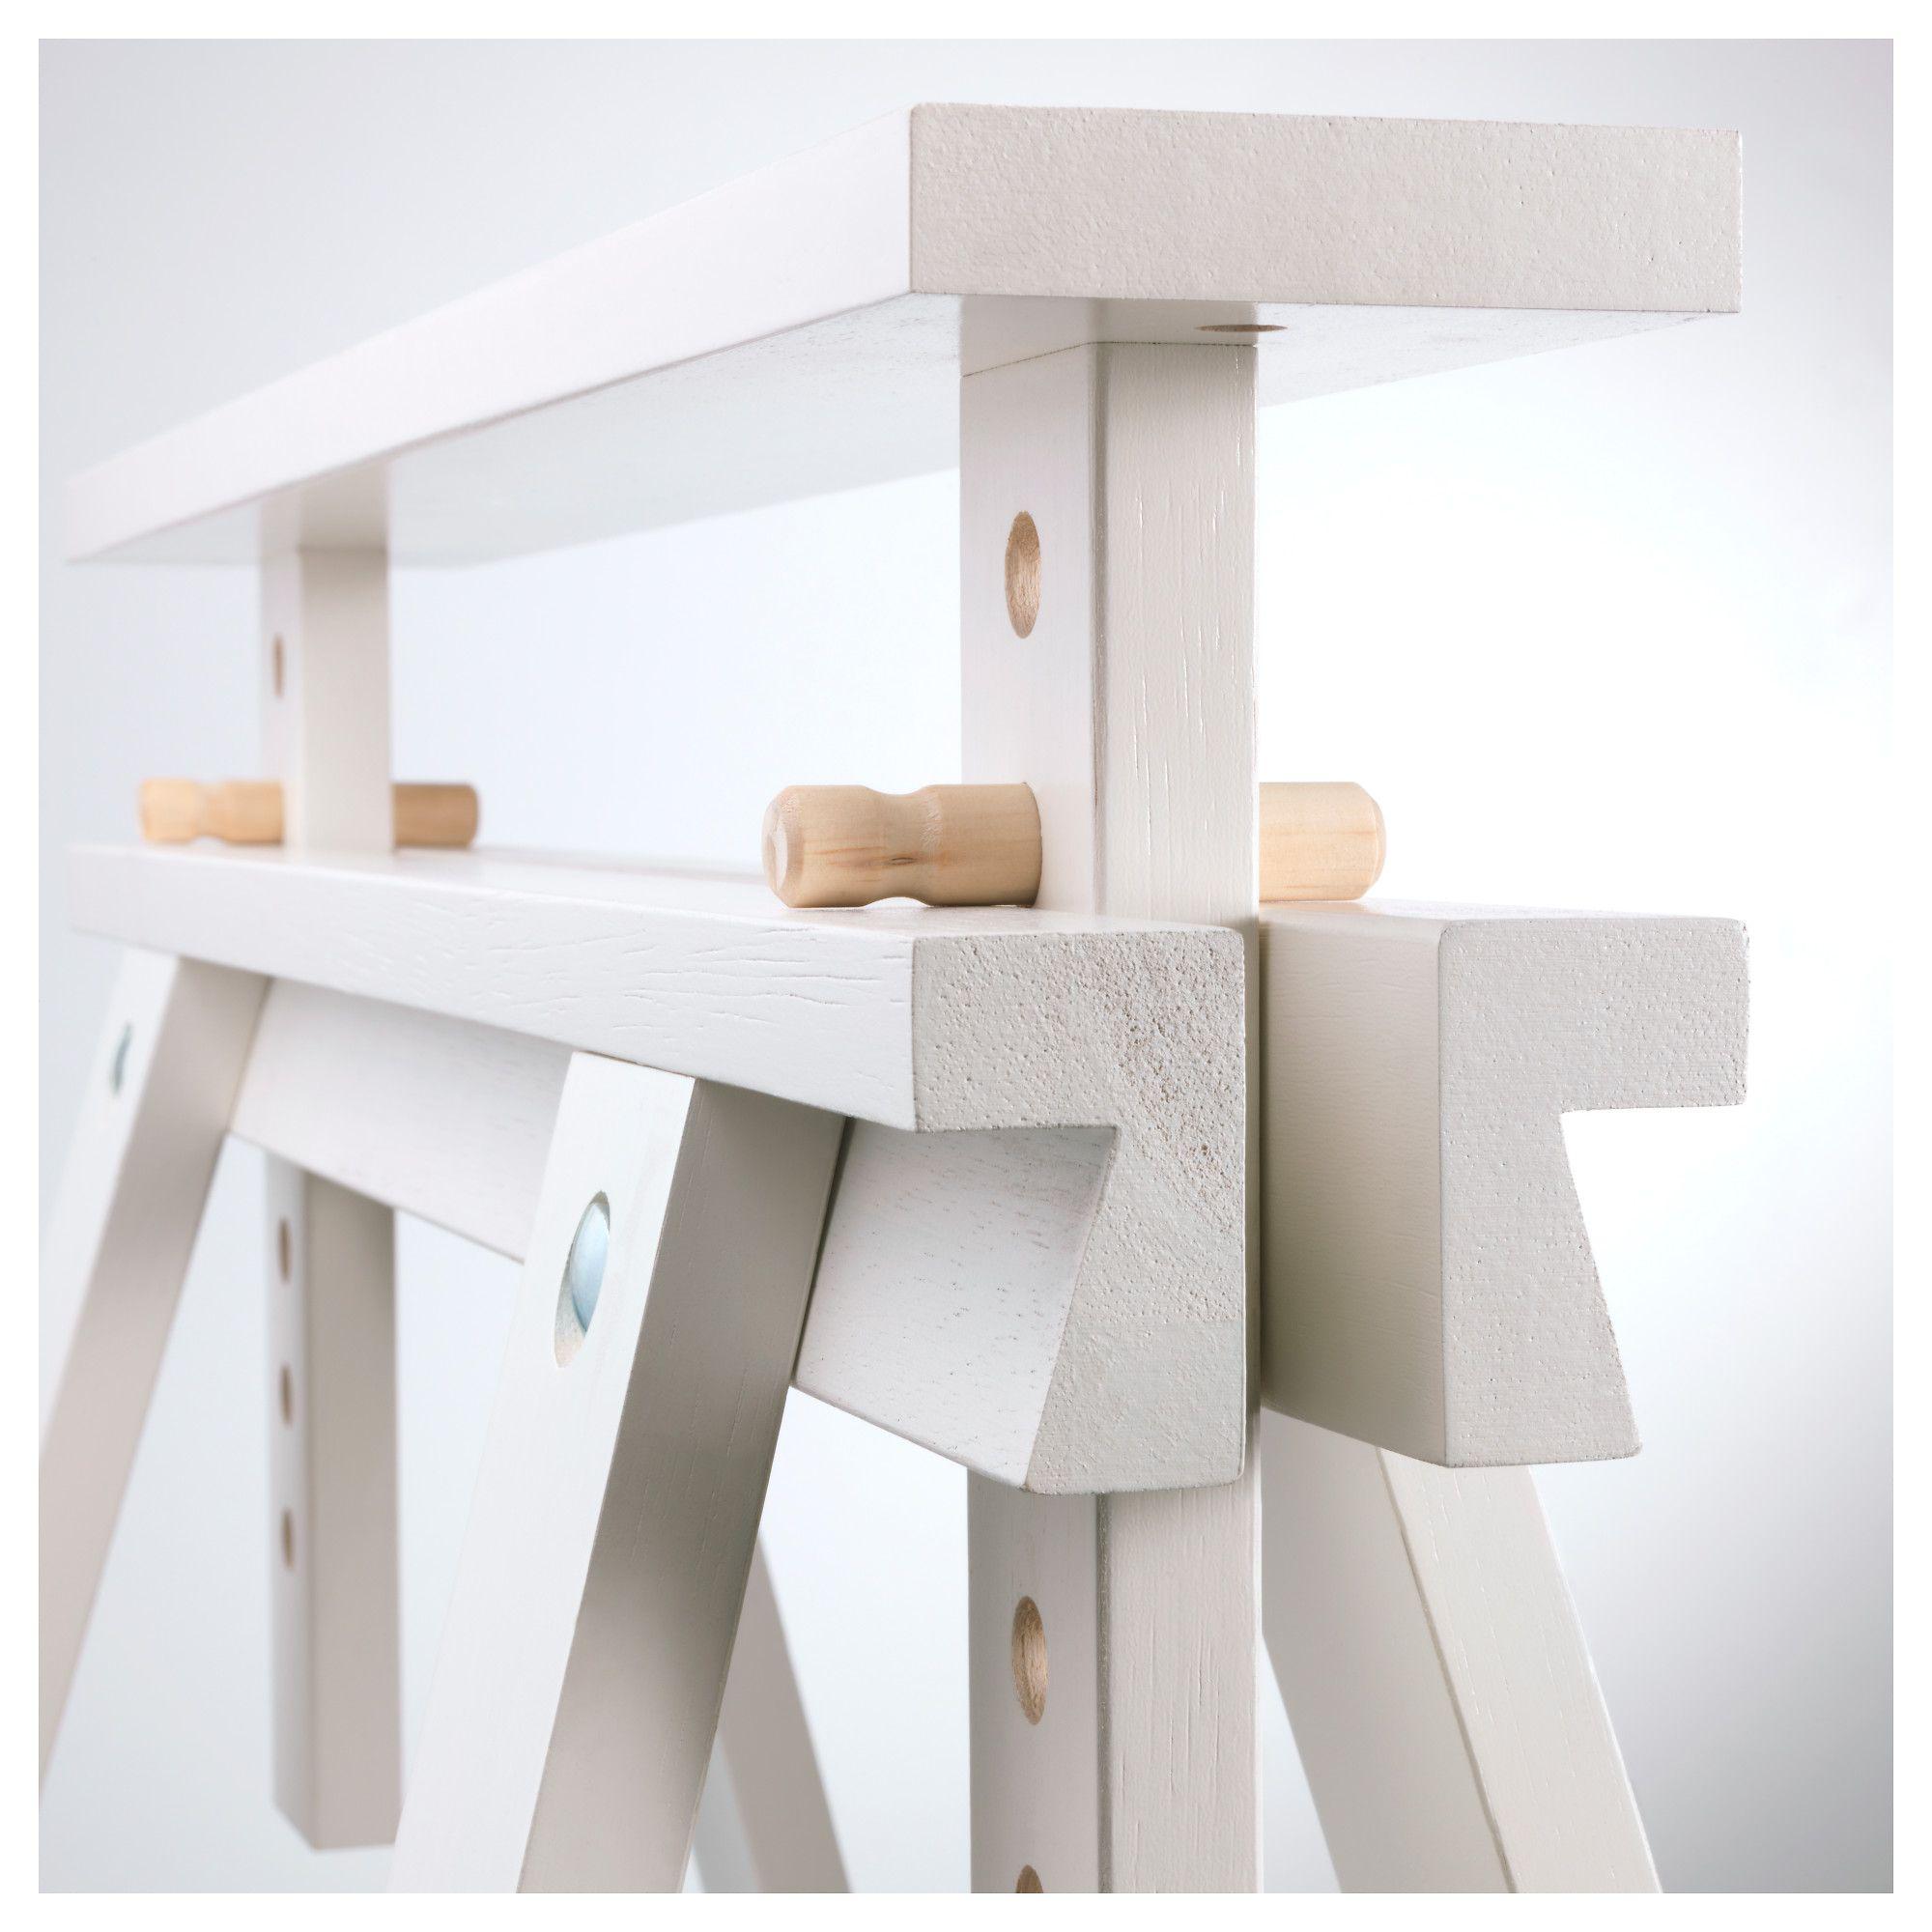 ikea finnvard trestle with shelf white products pinterest. Black Bedroom Furniture Sets. Home Design Ideas